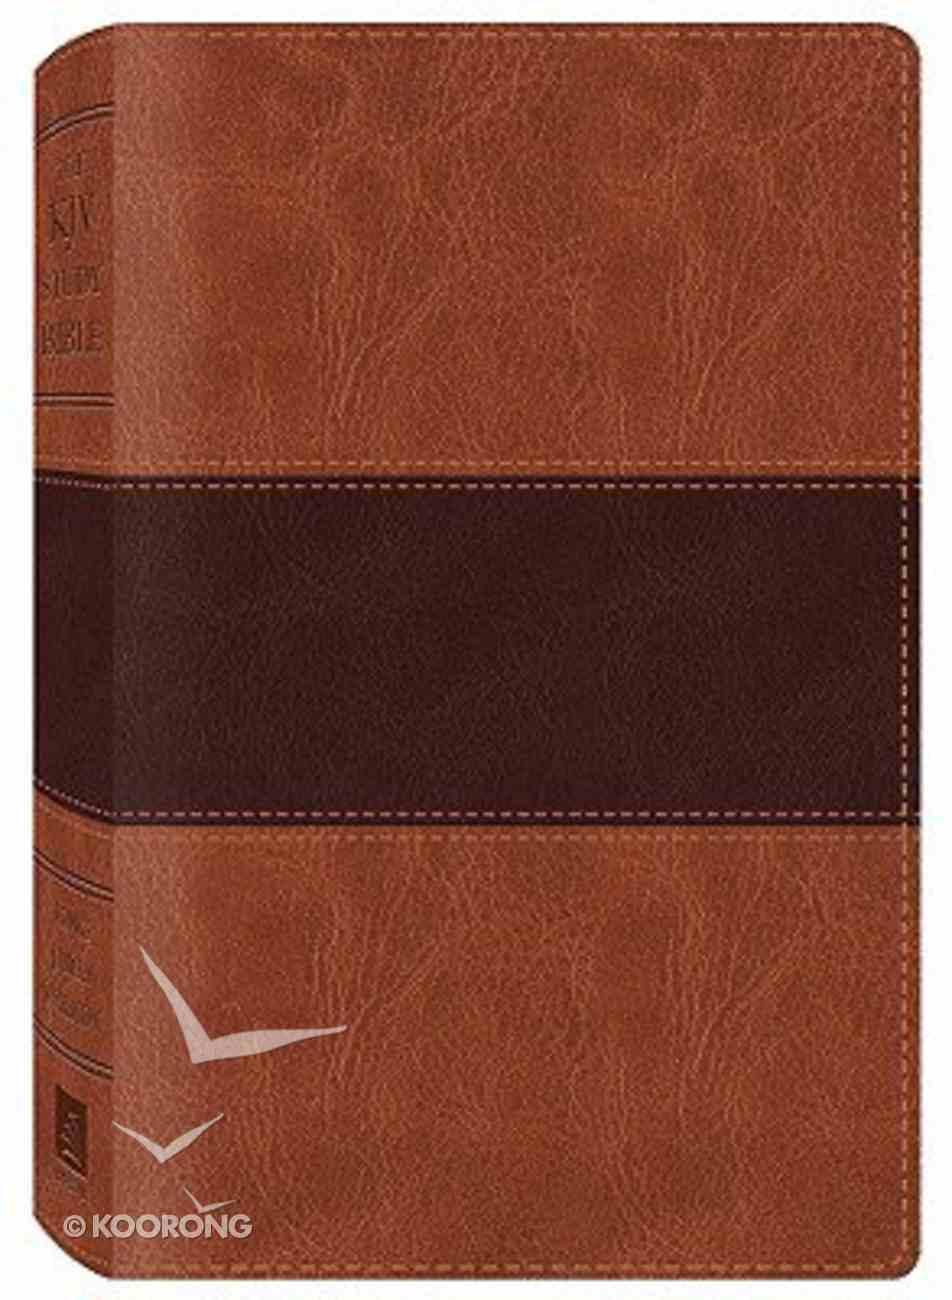 KJV Study Bible Brown Dicarta Imitation Leather